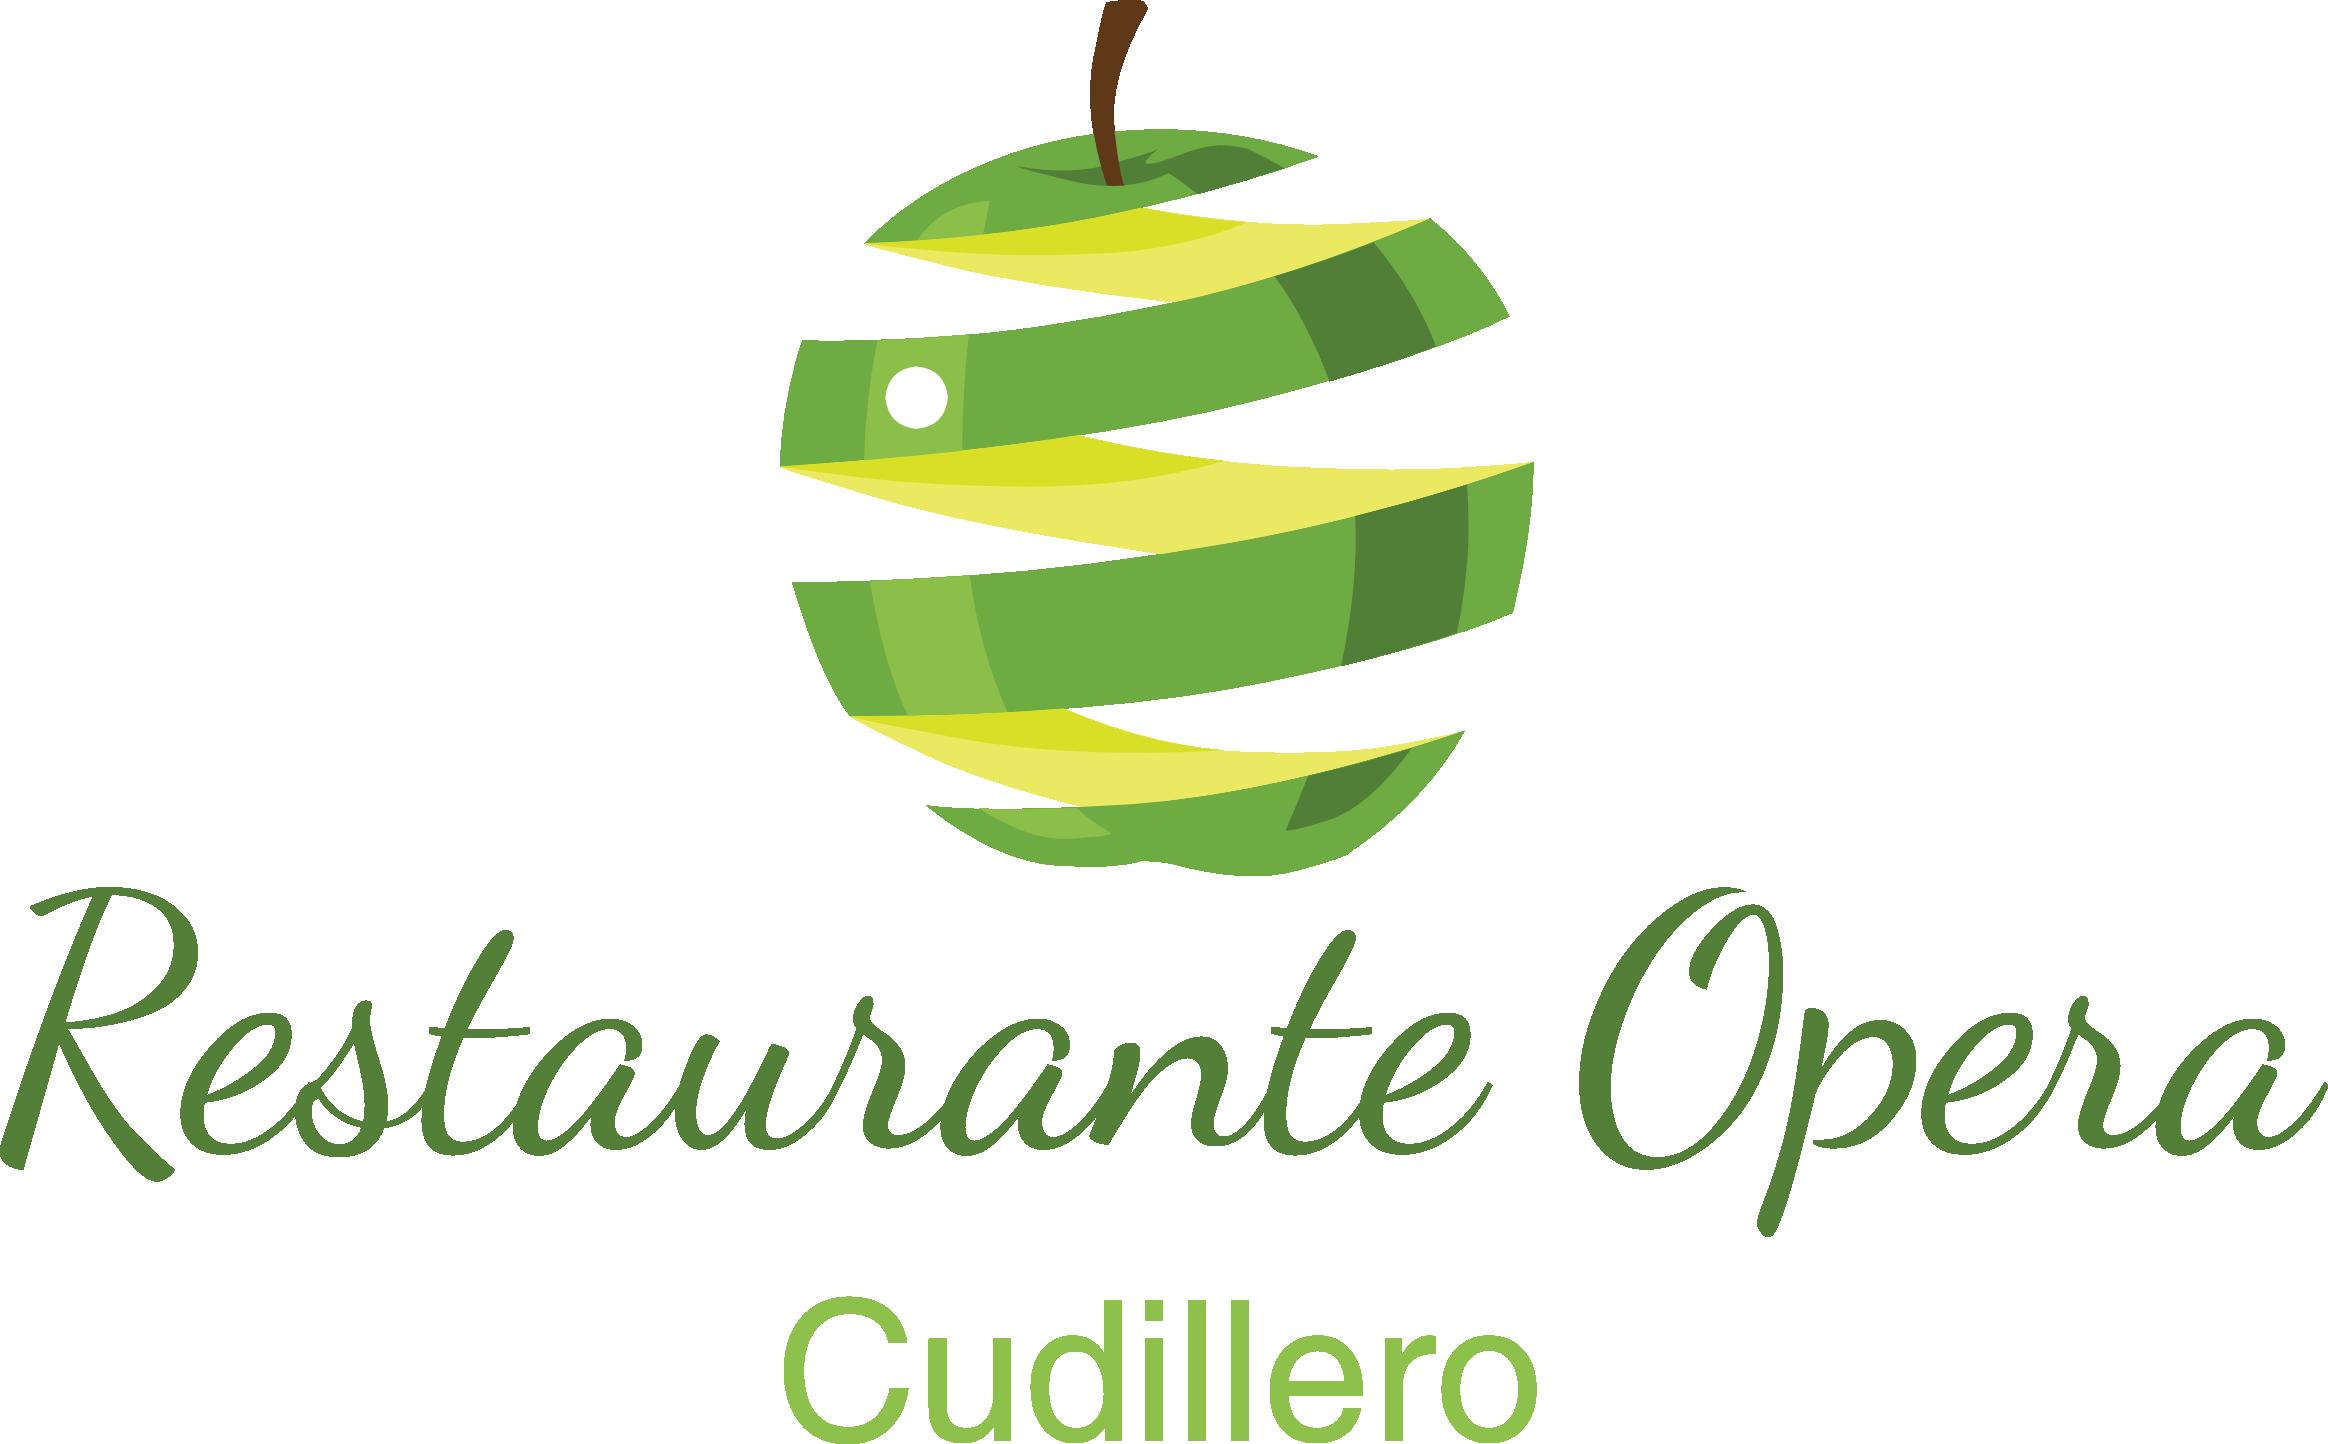 Opera Cudillero Restaurante